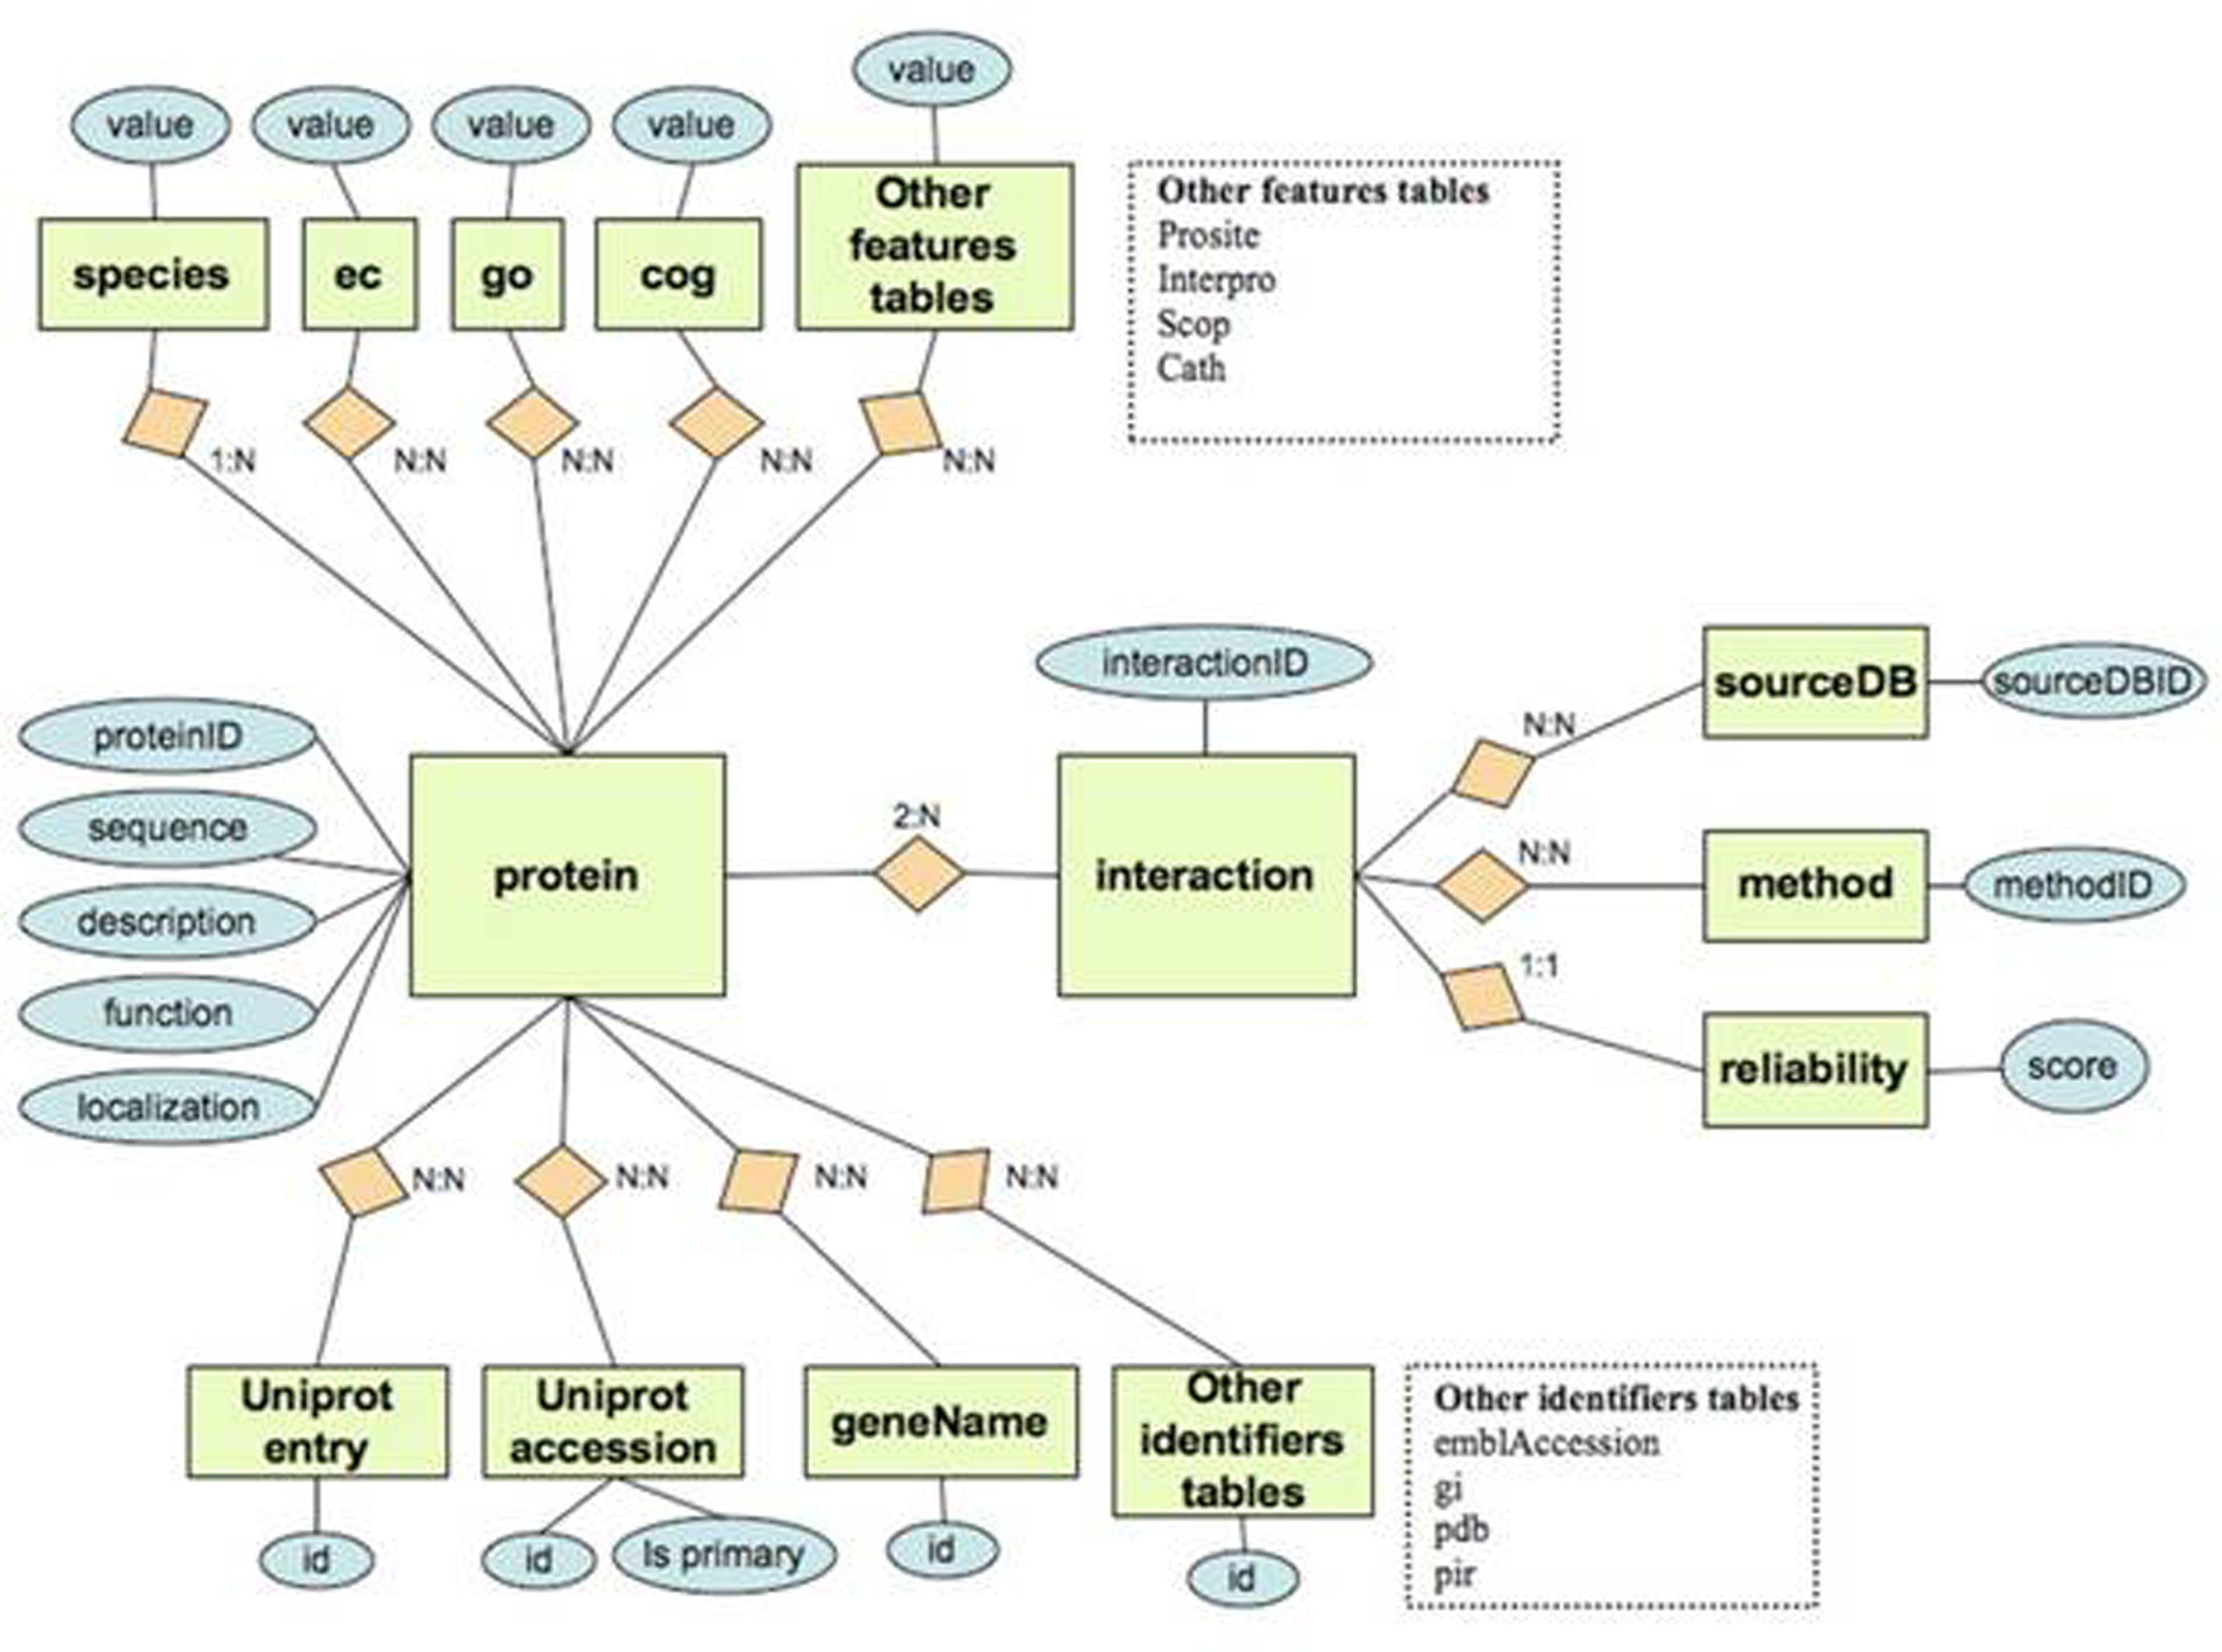 Relational database design file 1 the relational database relational database design file 1 the relational database design of the baditri Image collections